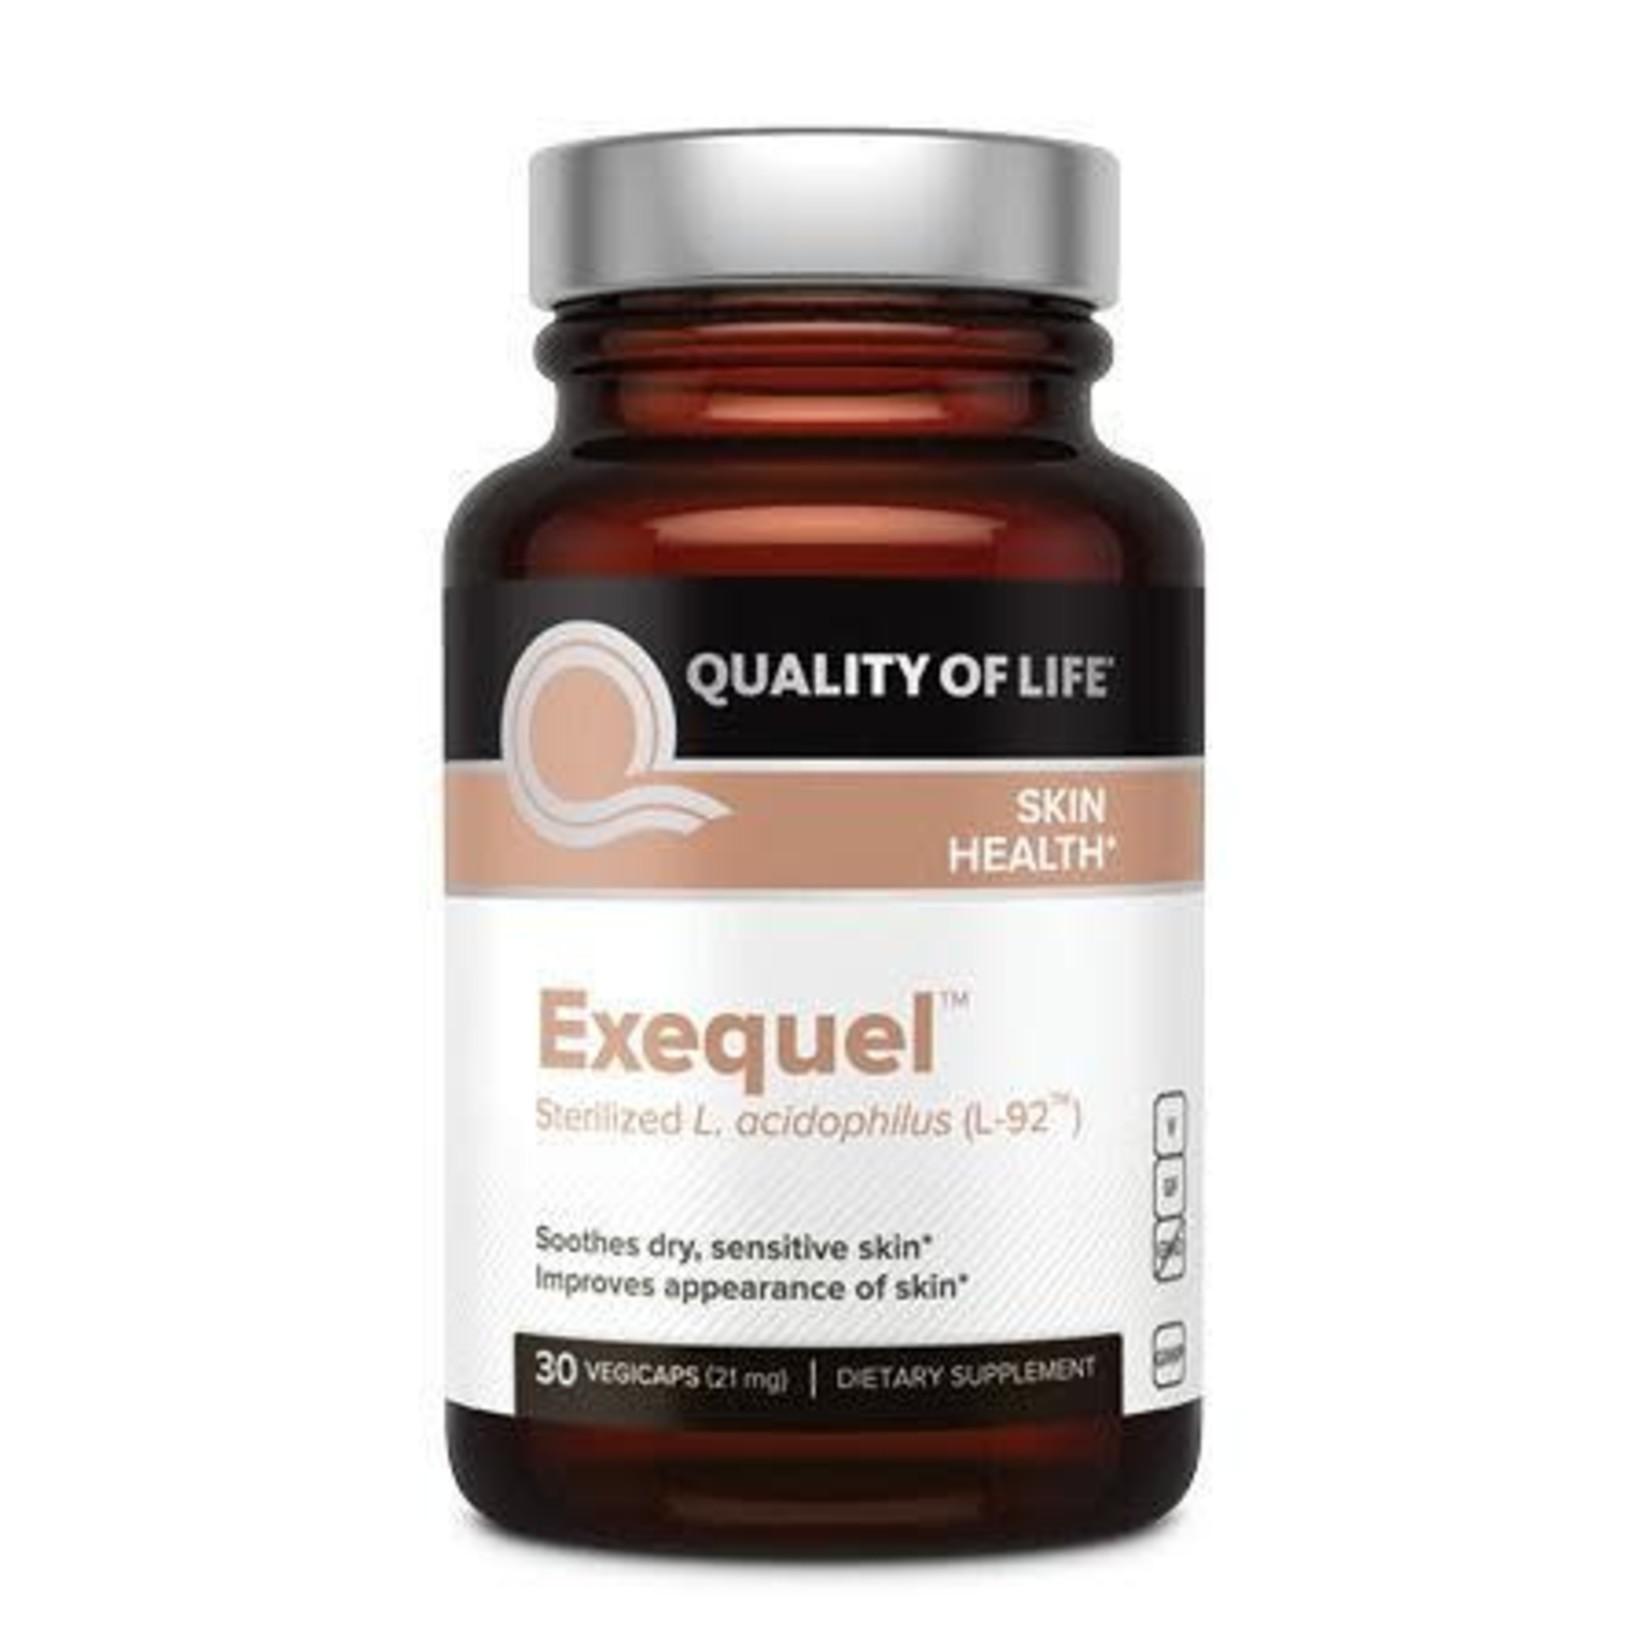 Quality of Life QOL Exequel Skin Health 30 Vegi caps